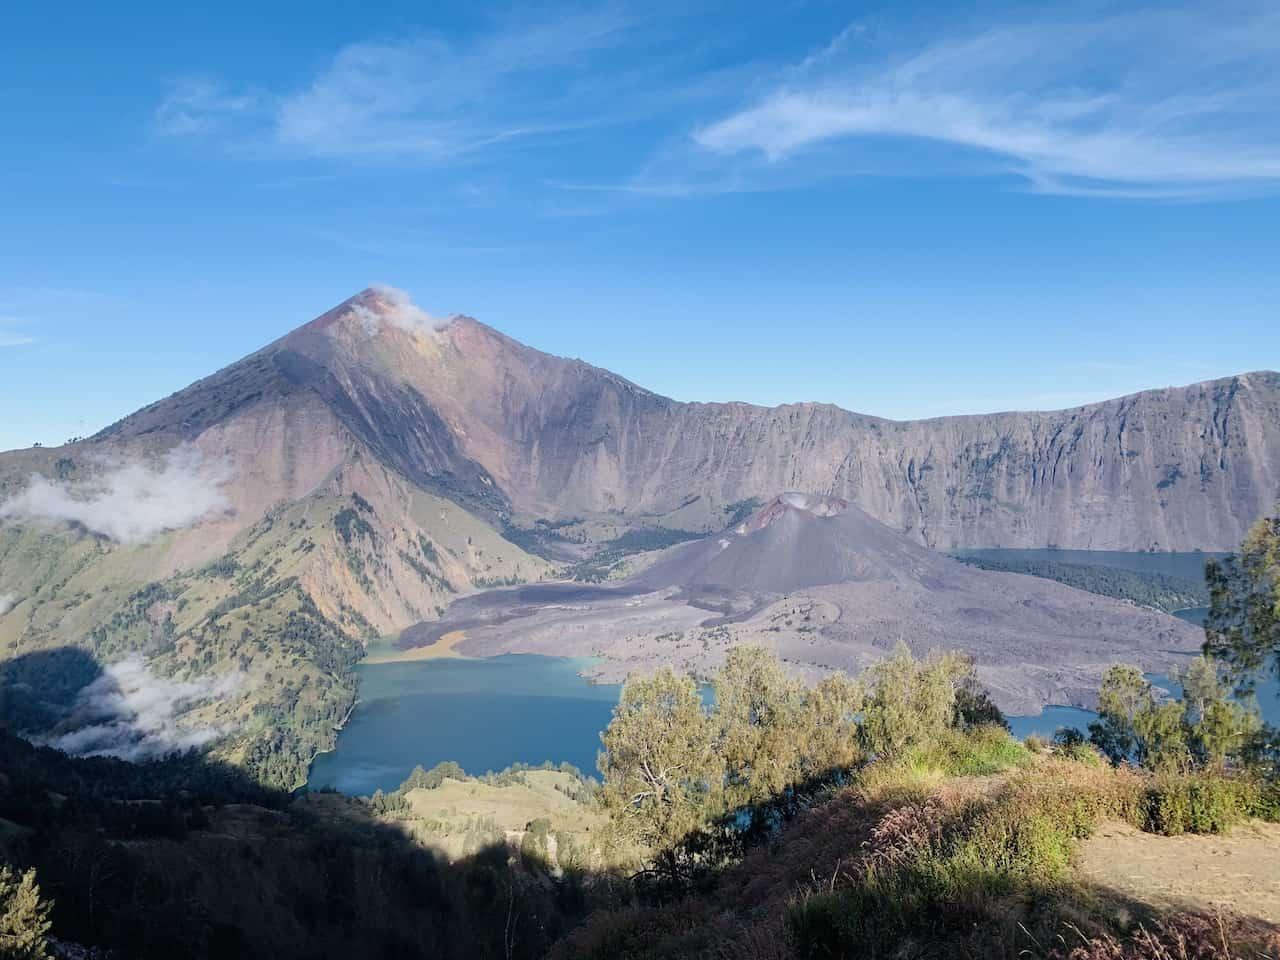 Senaru Crater Rim View